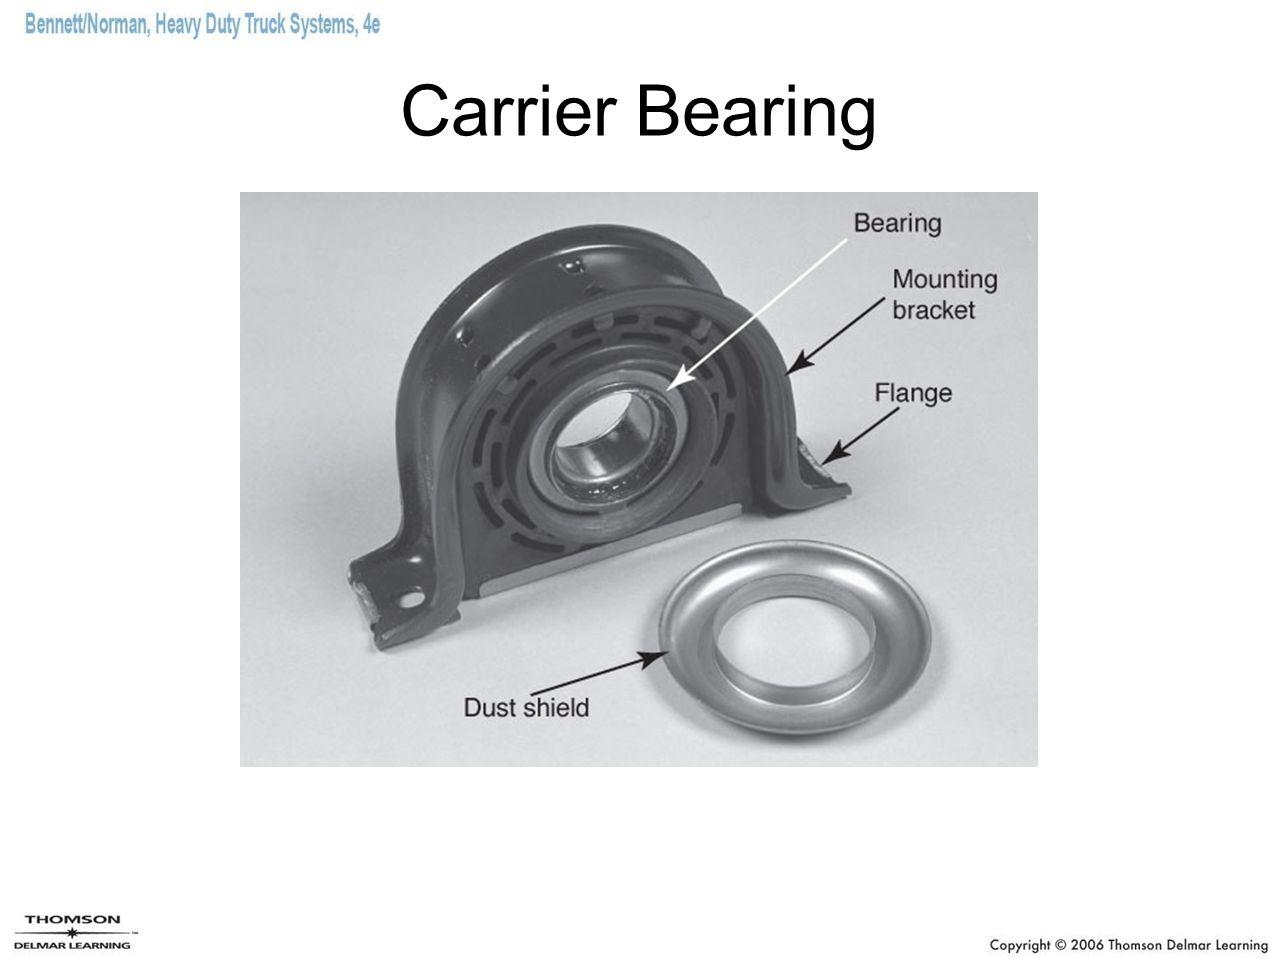 Carrier Bearing